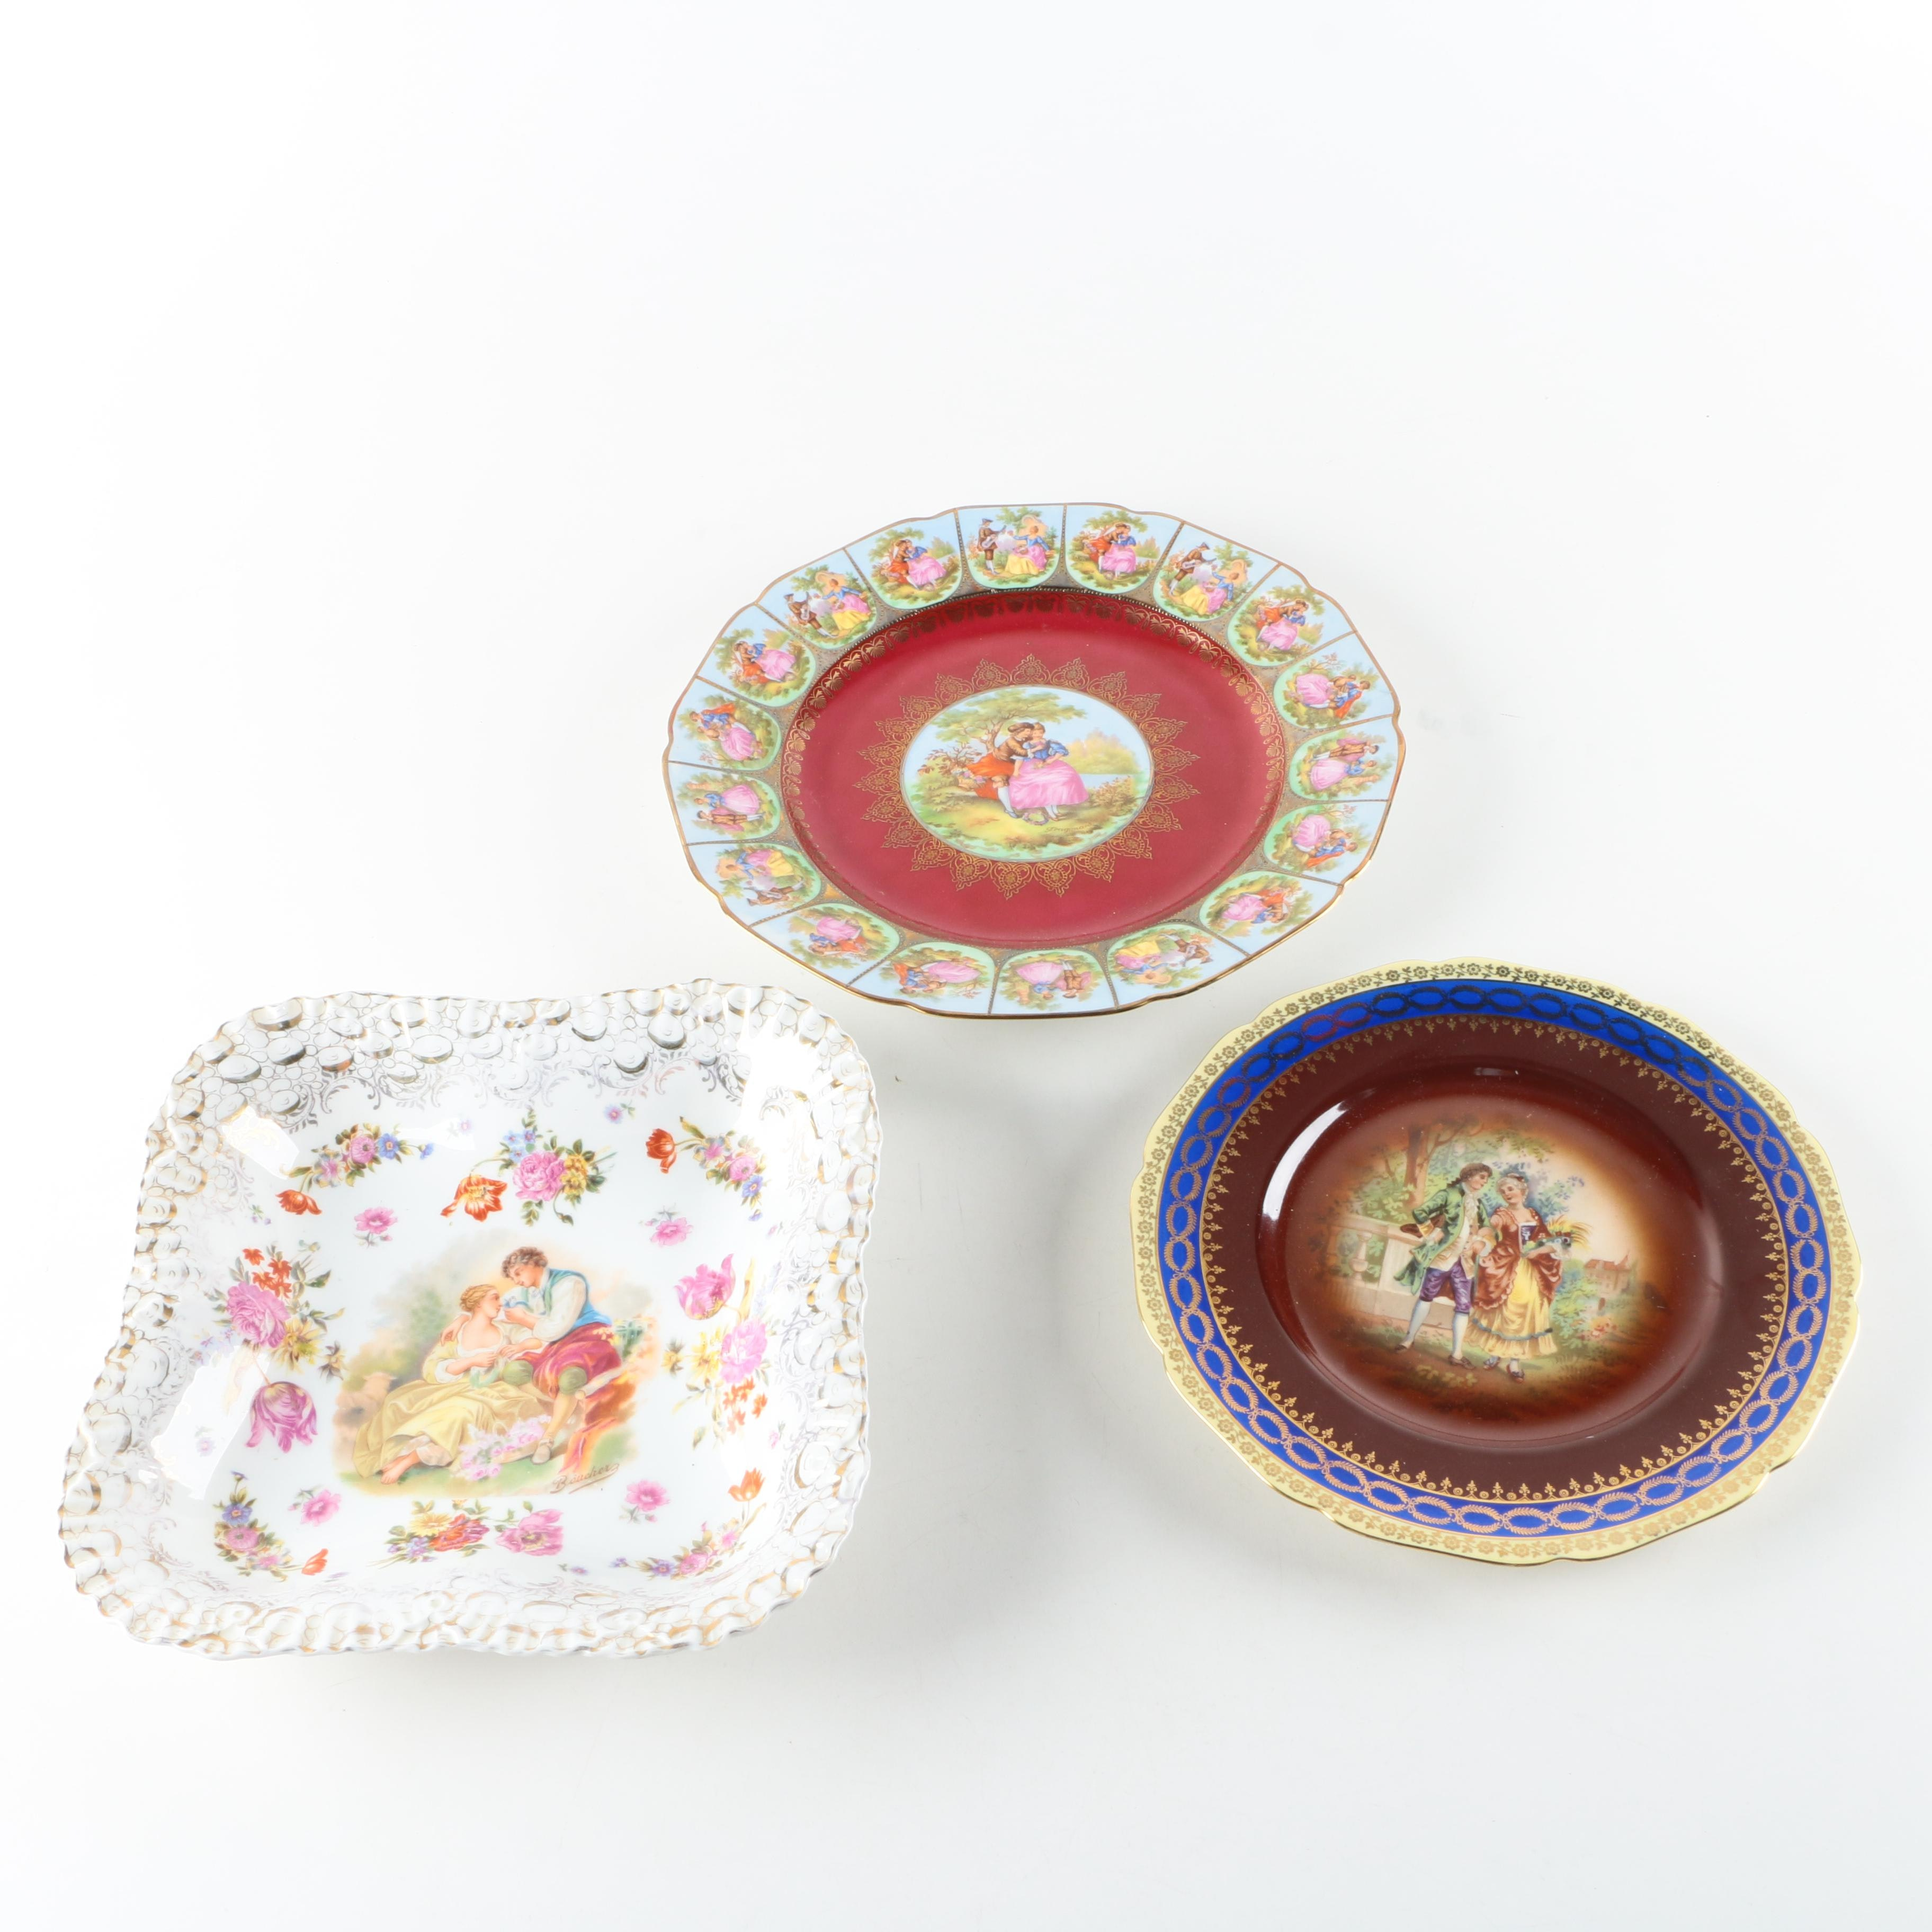 Painted Romance-themed Porcelain Plates